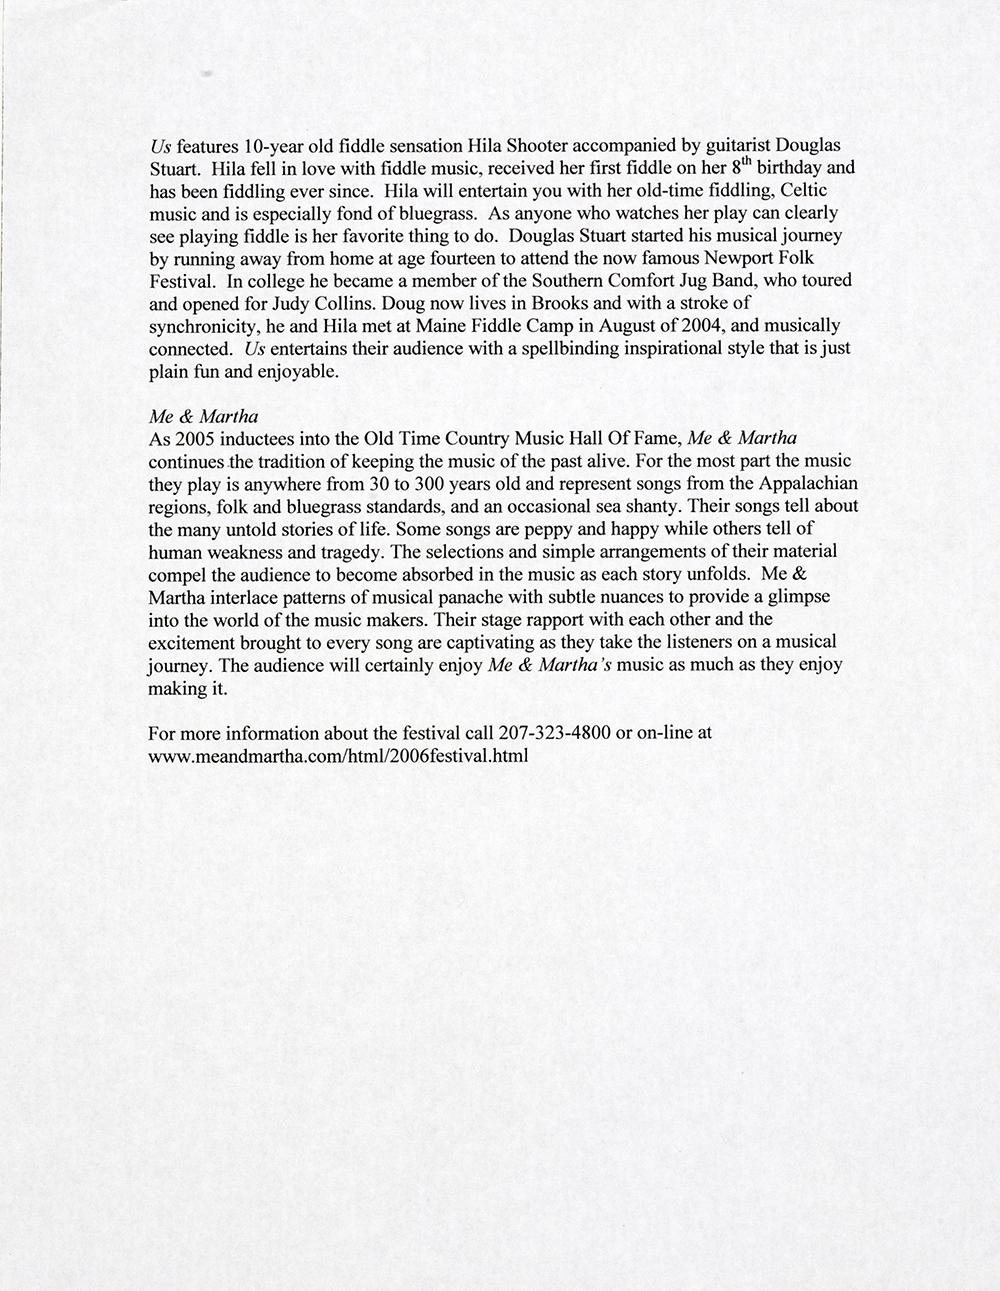 BIOG-0699, 1st Annual Spring Mid-Coast Festival, Page 2